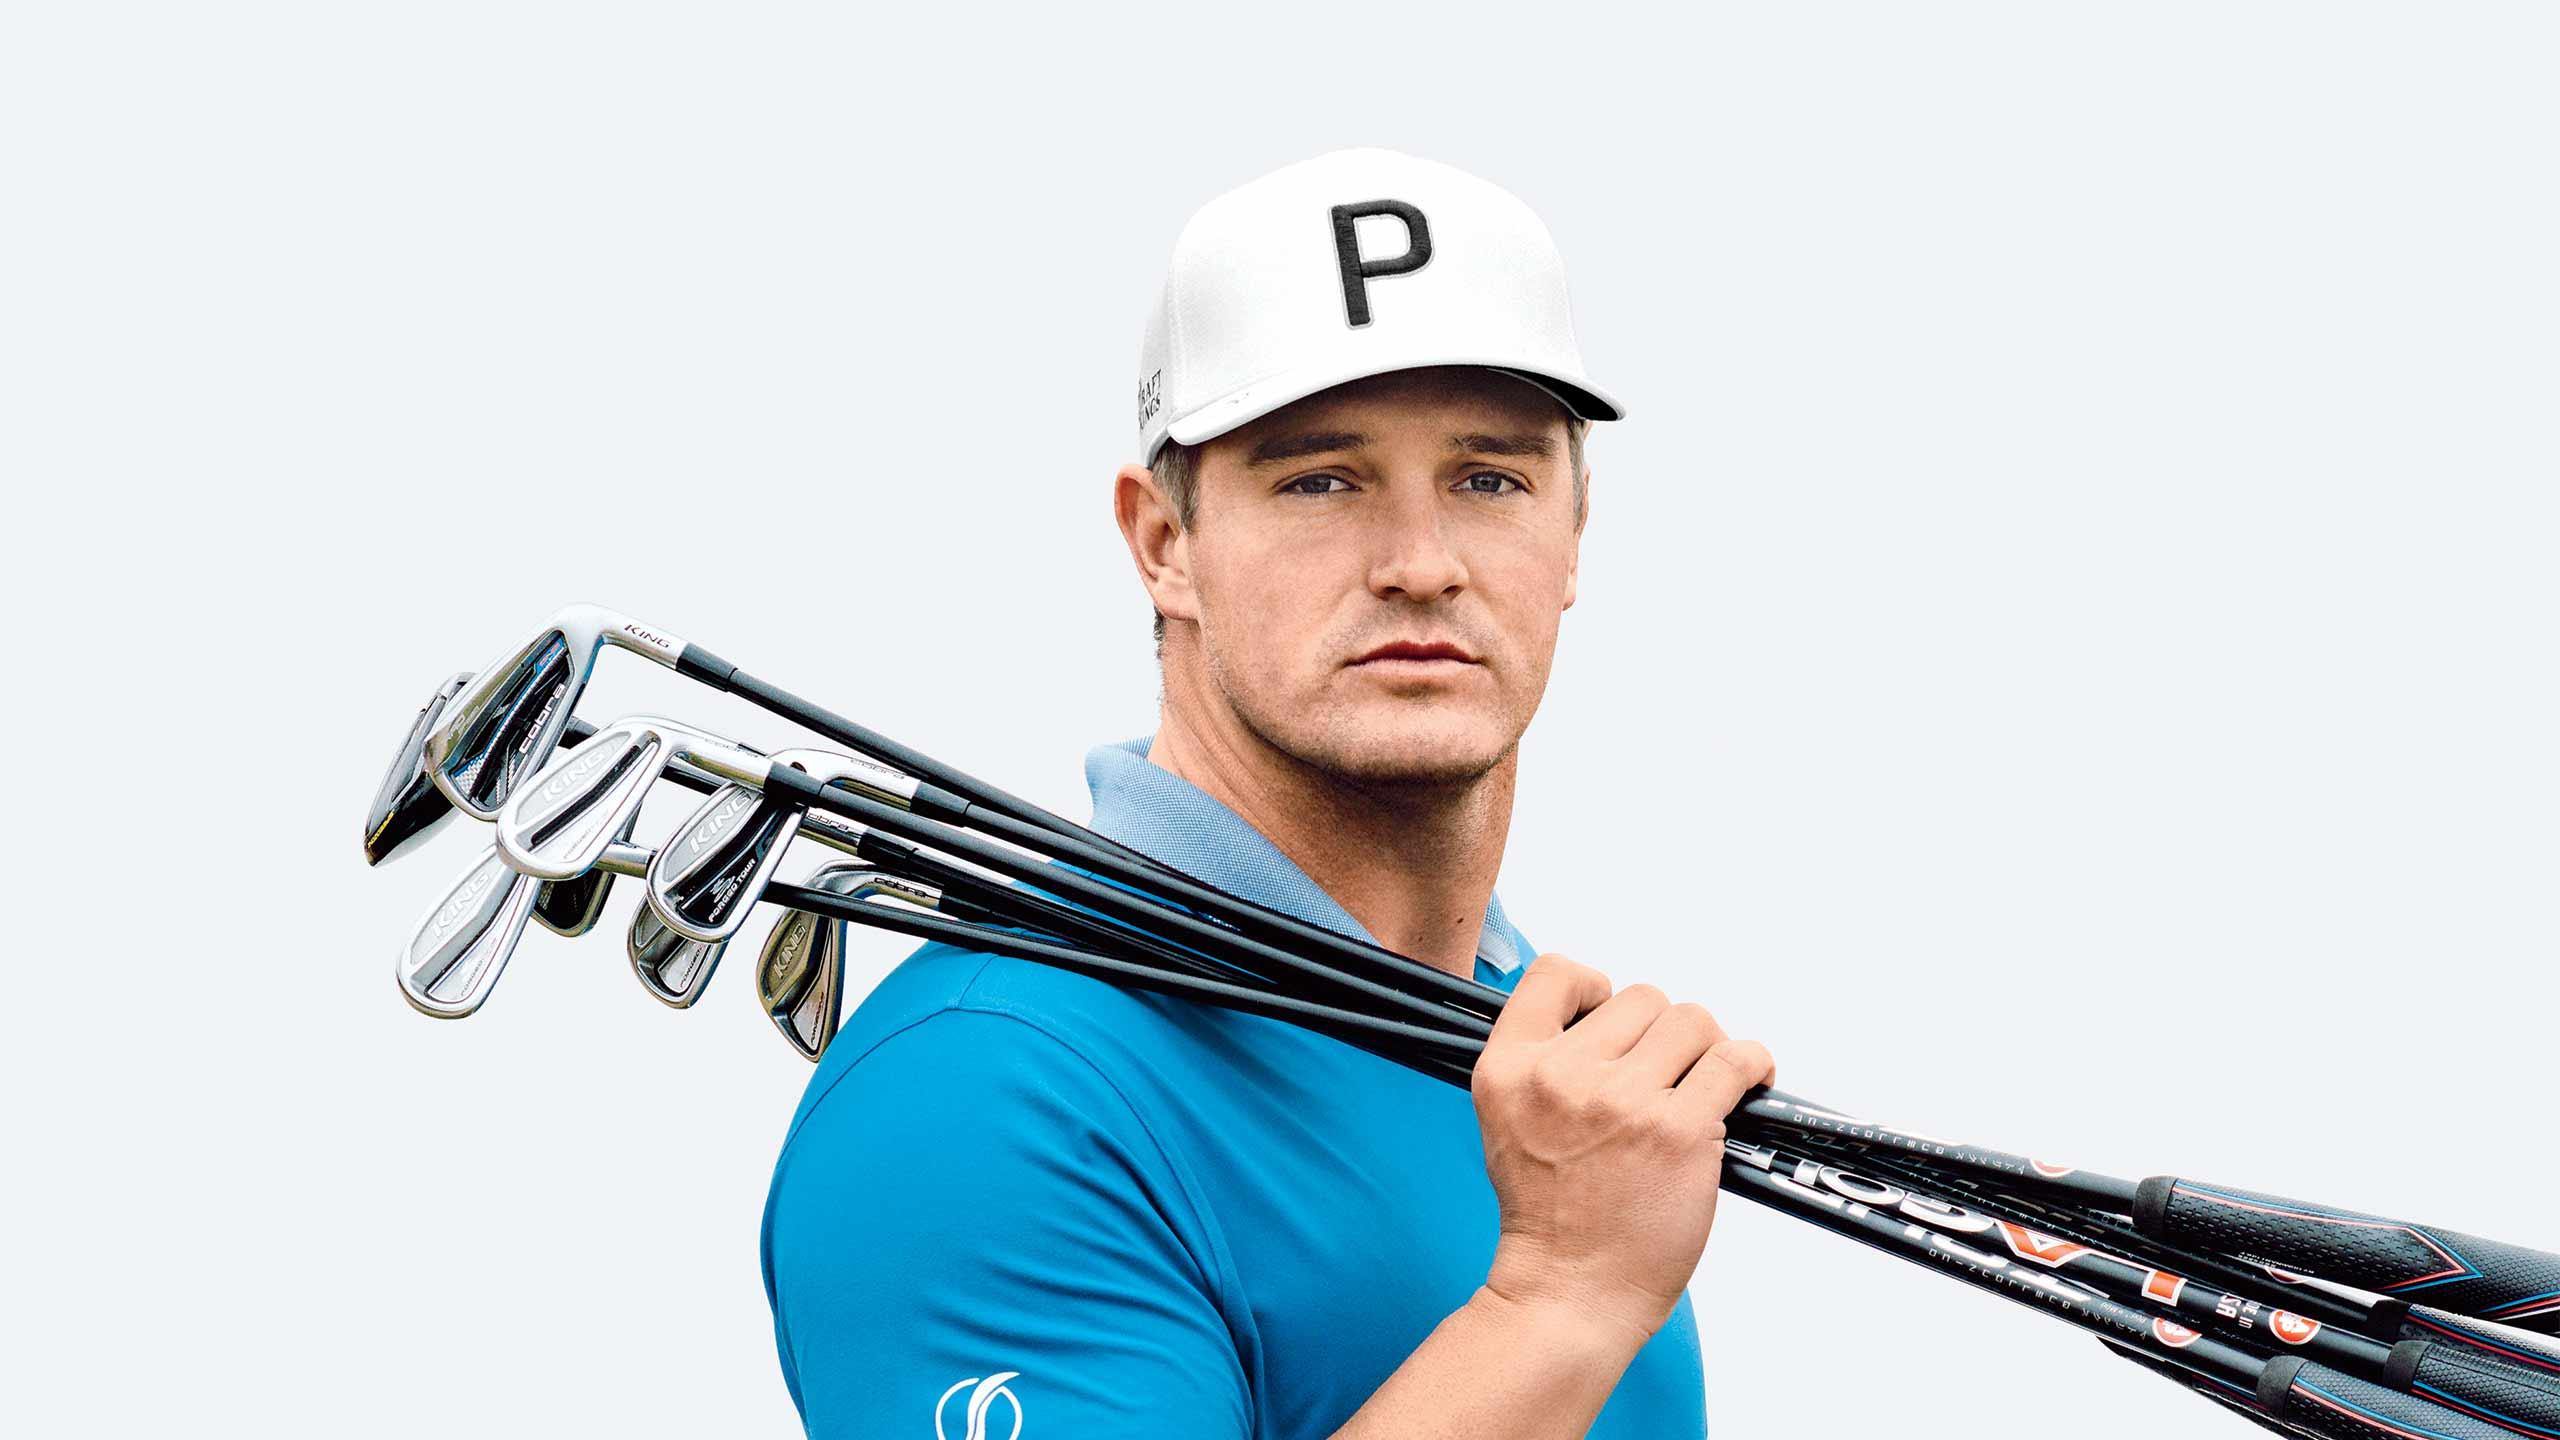 Bryson DeChambeau holds golf clubs.